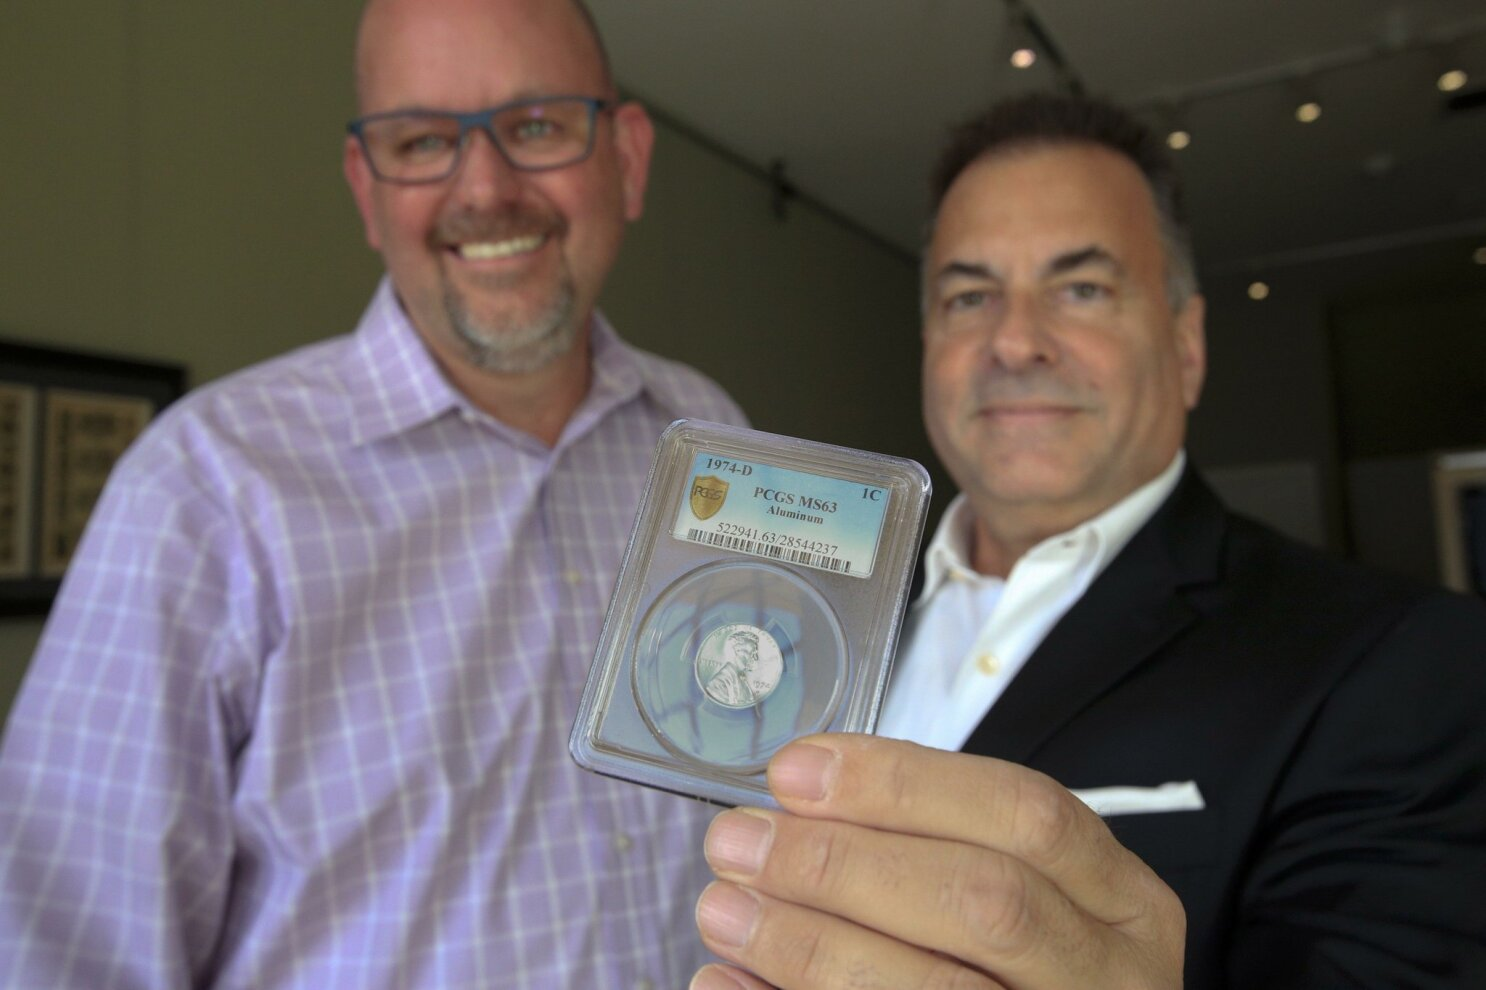 Rare aluminum penny goes back to feds - The San Diego Union-Tribune